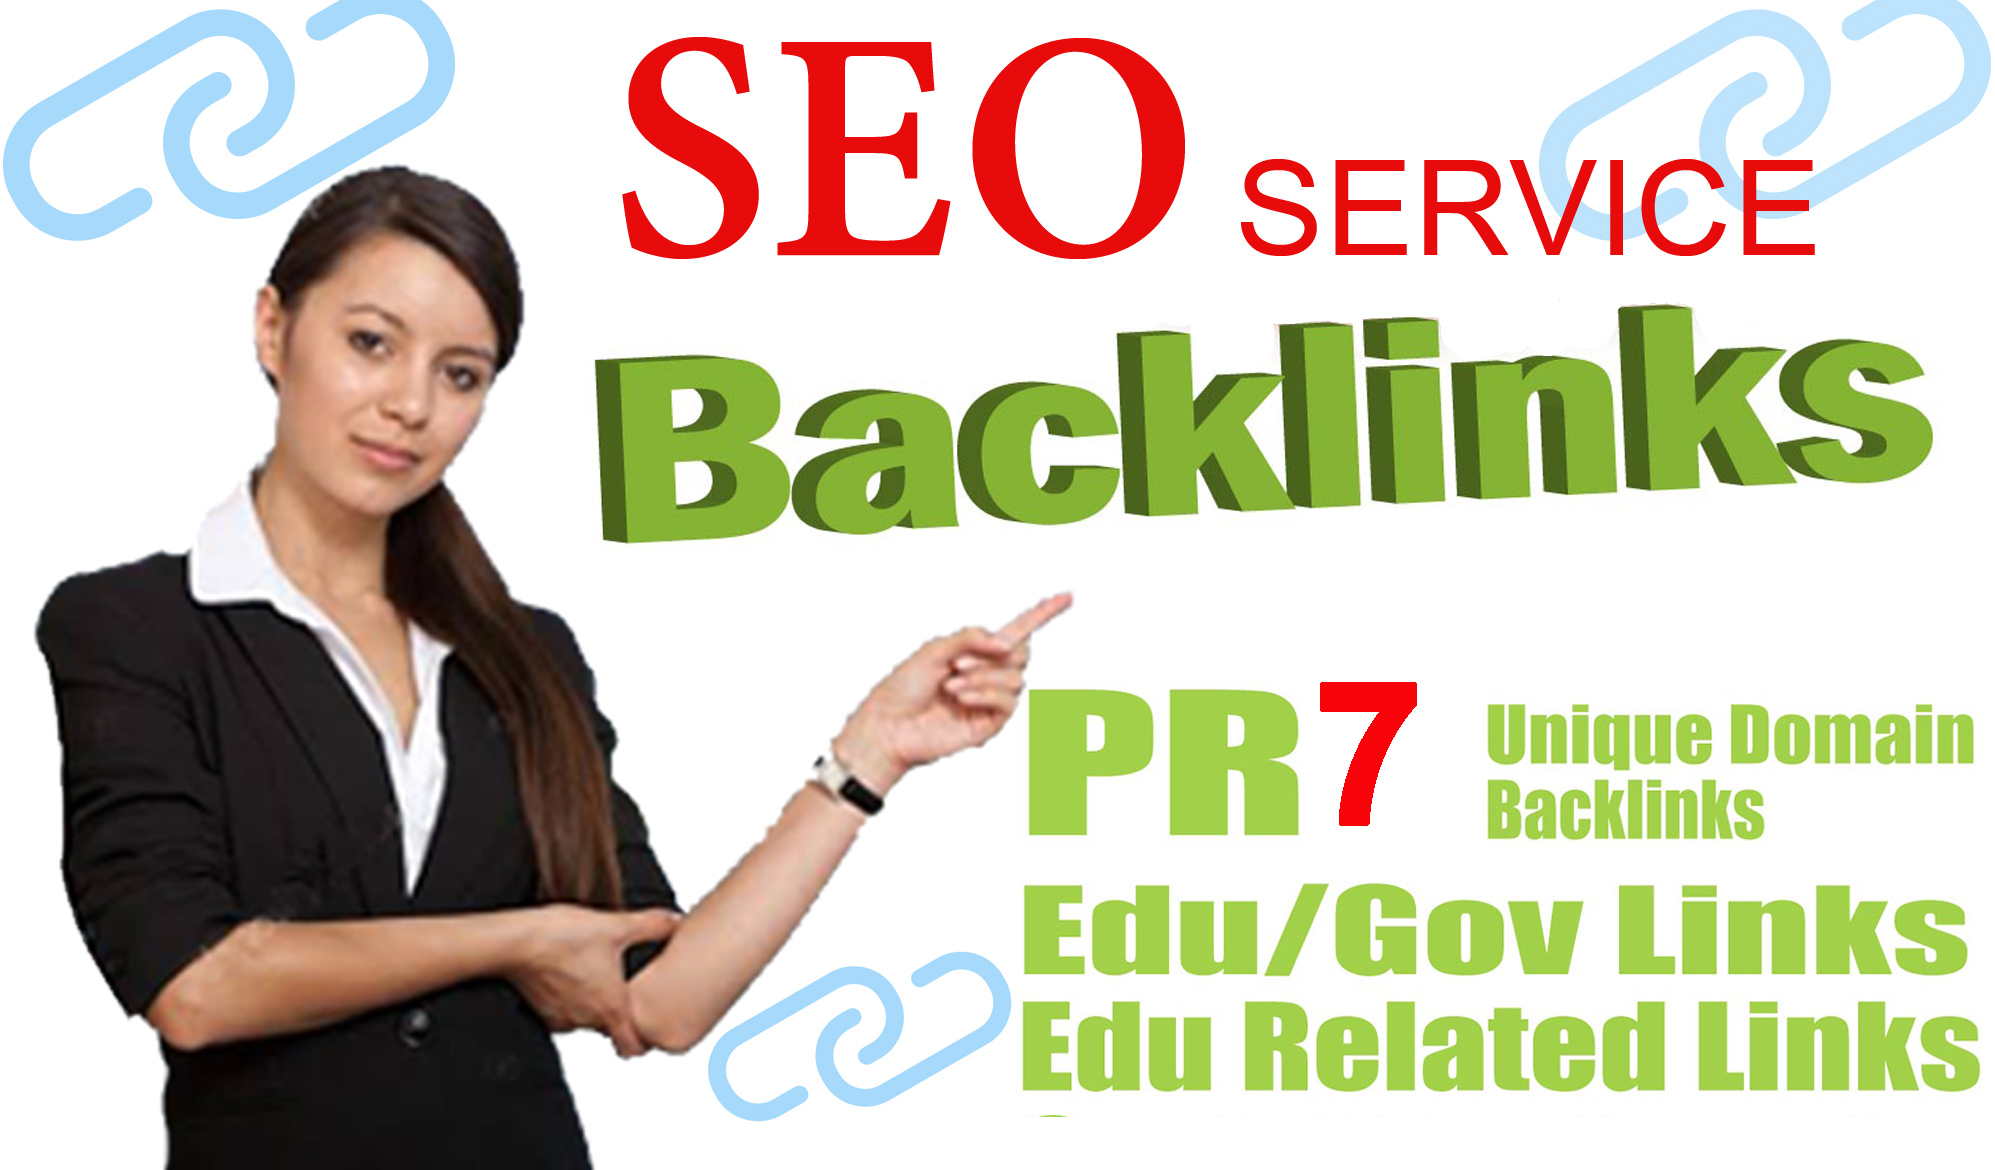 Create 50 Unique Domain Profile Backlinks Manually with 80+ High DA/PA